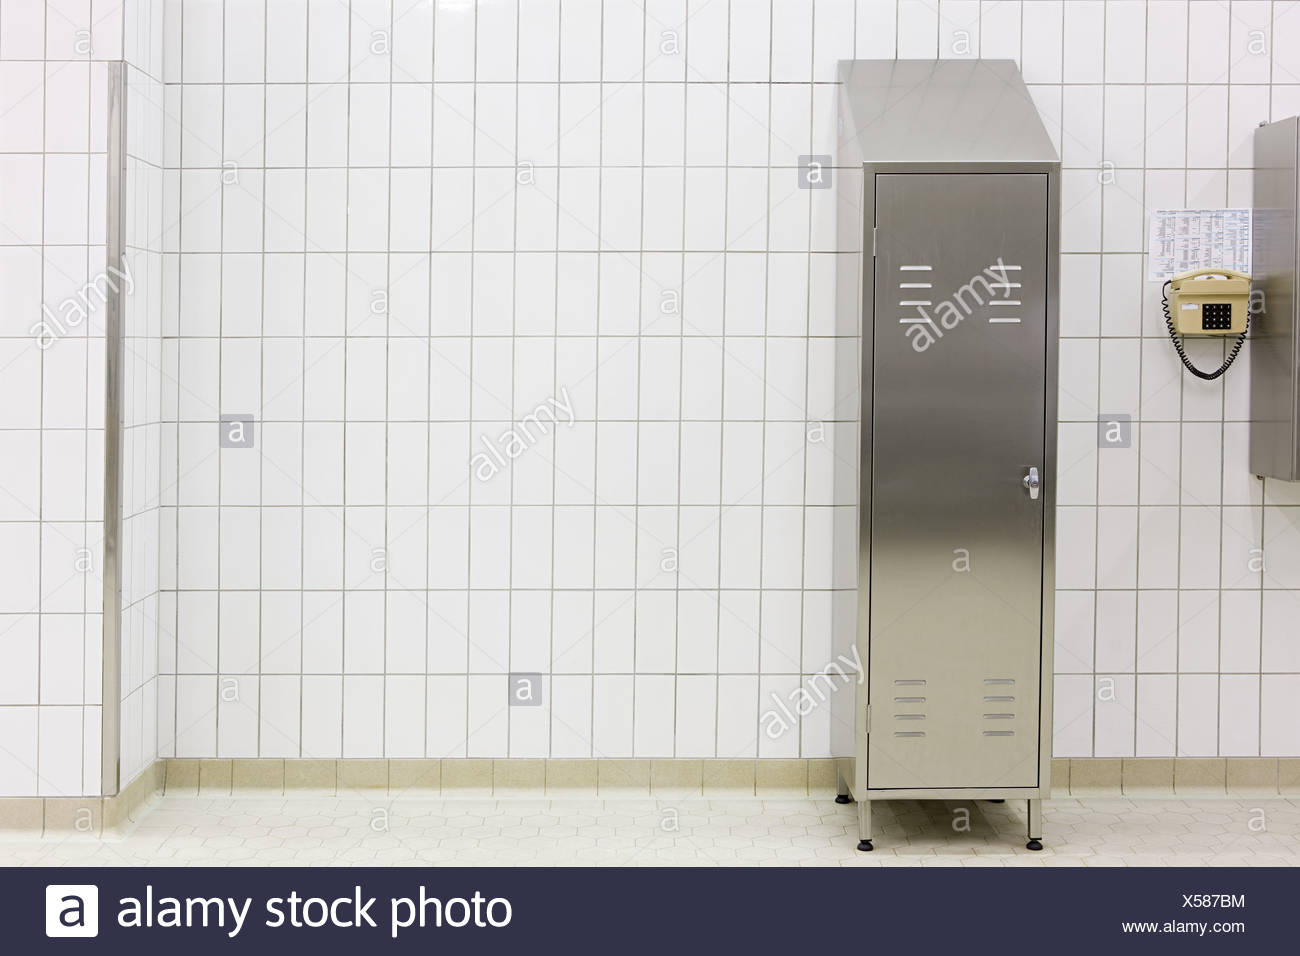 Metal locker in a tiled room - Stock Image